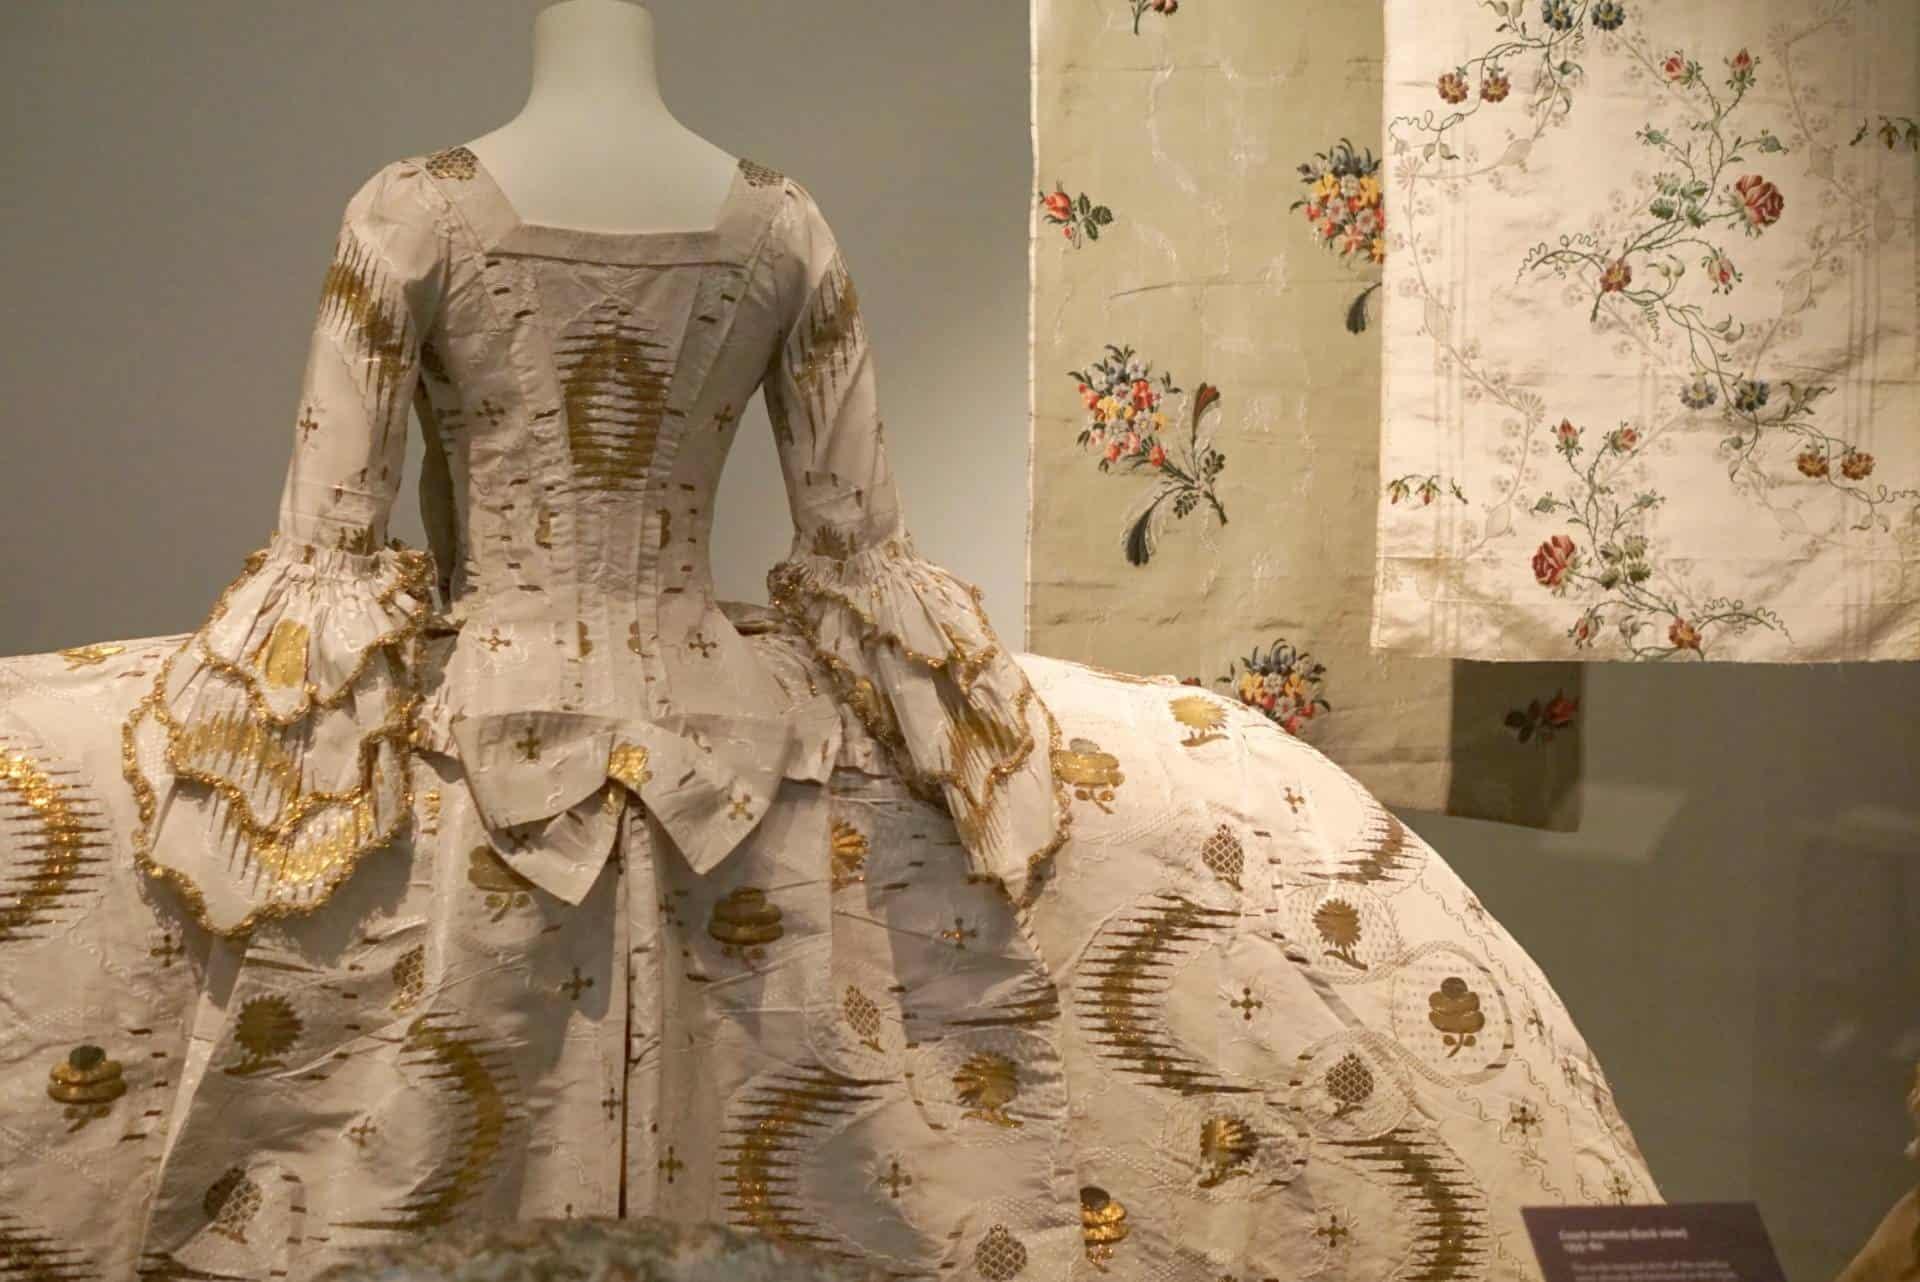 Fashion At The Victoria & Albert, My Sunday Photo